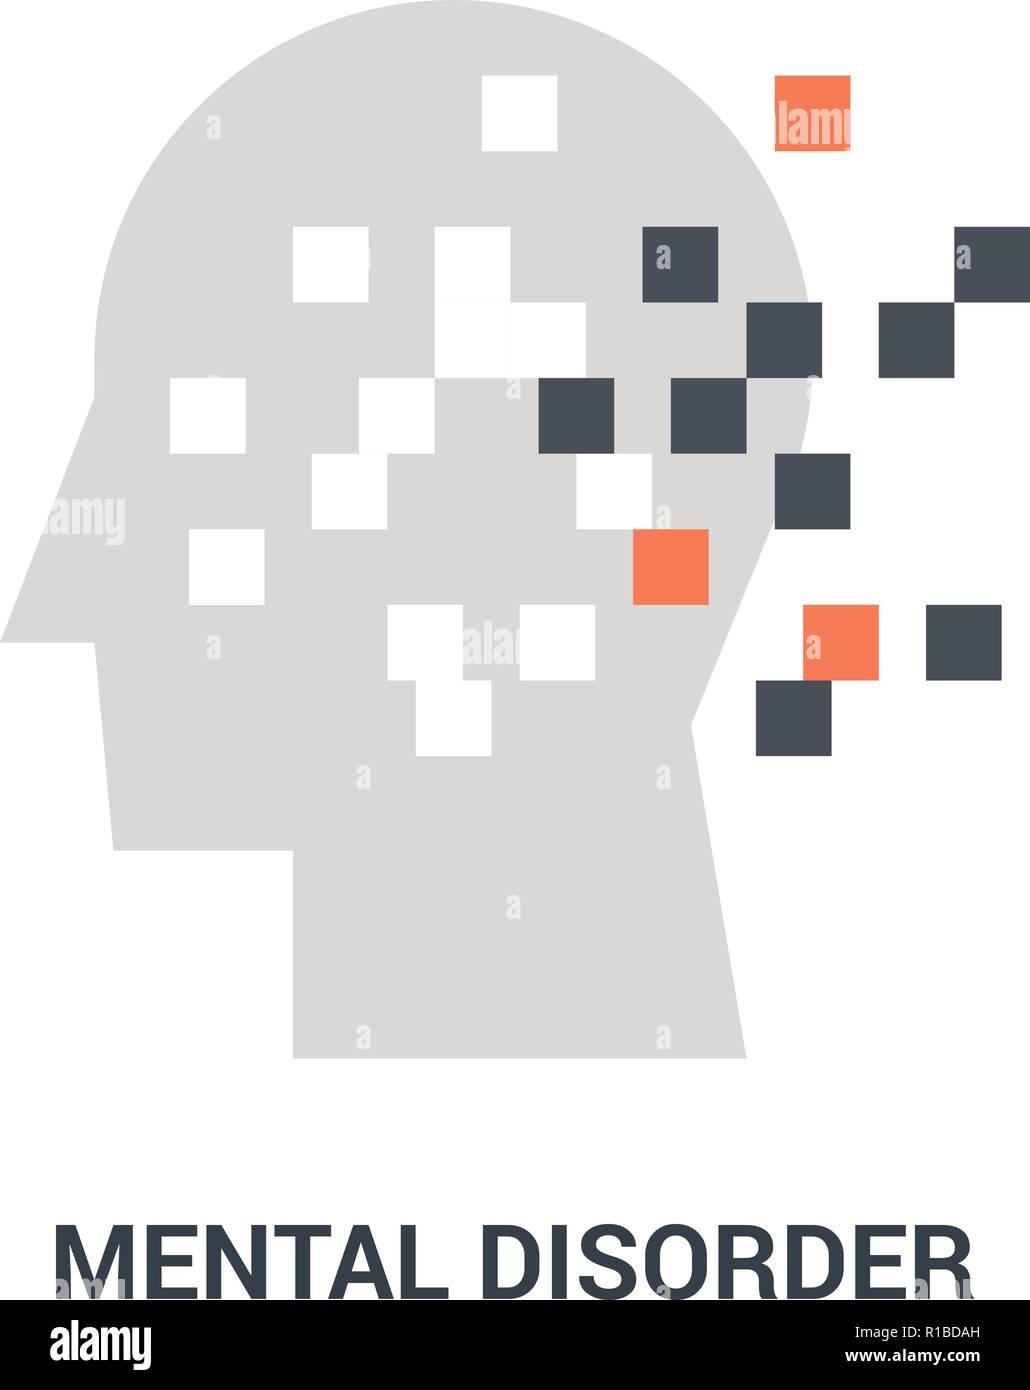 mental disorder icon concept - Stock Image